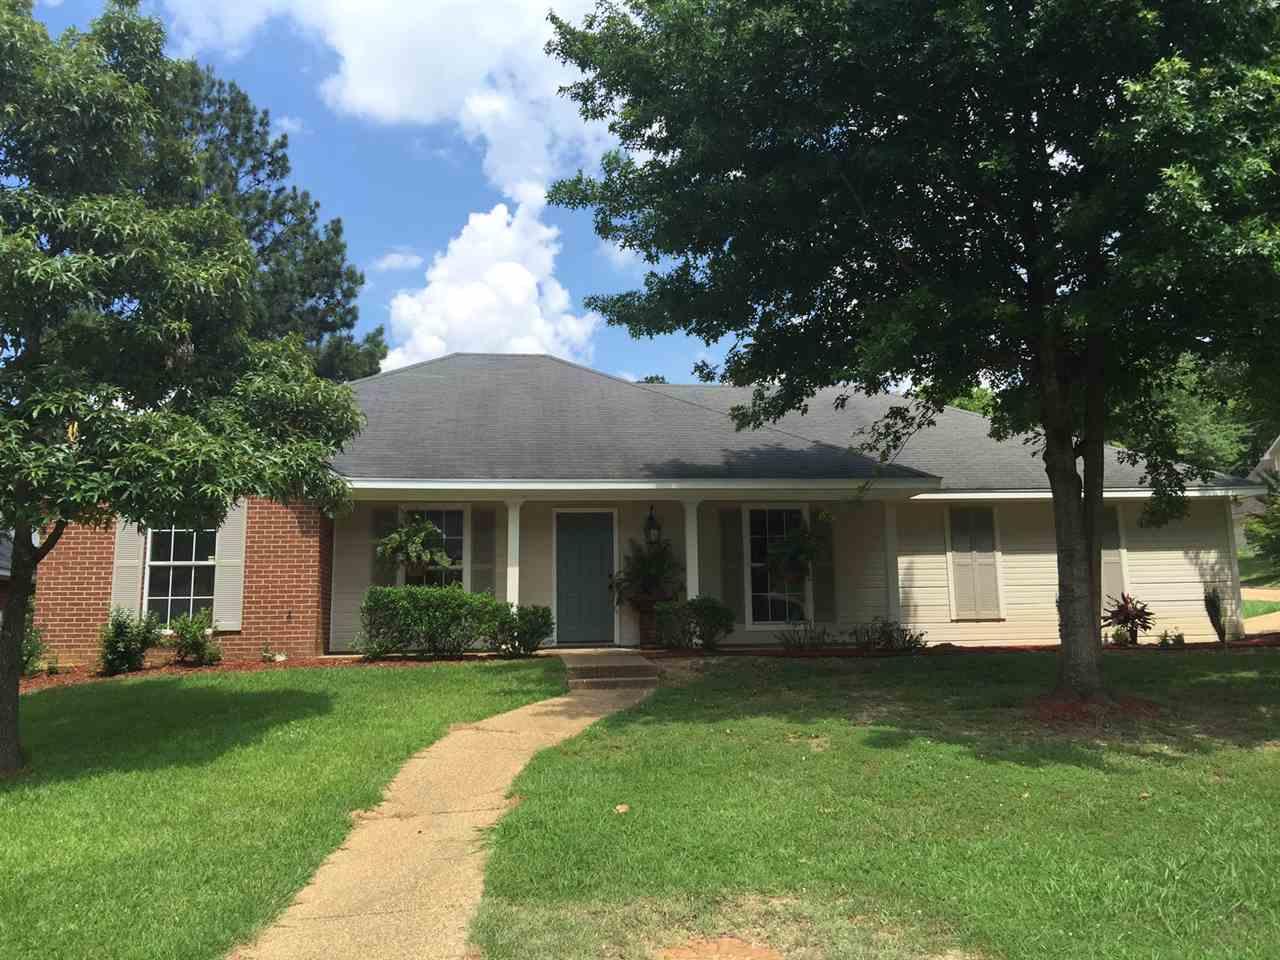 Real Estate for Sale, ListingId: 33839413, Ridgeland,MS39157